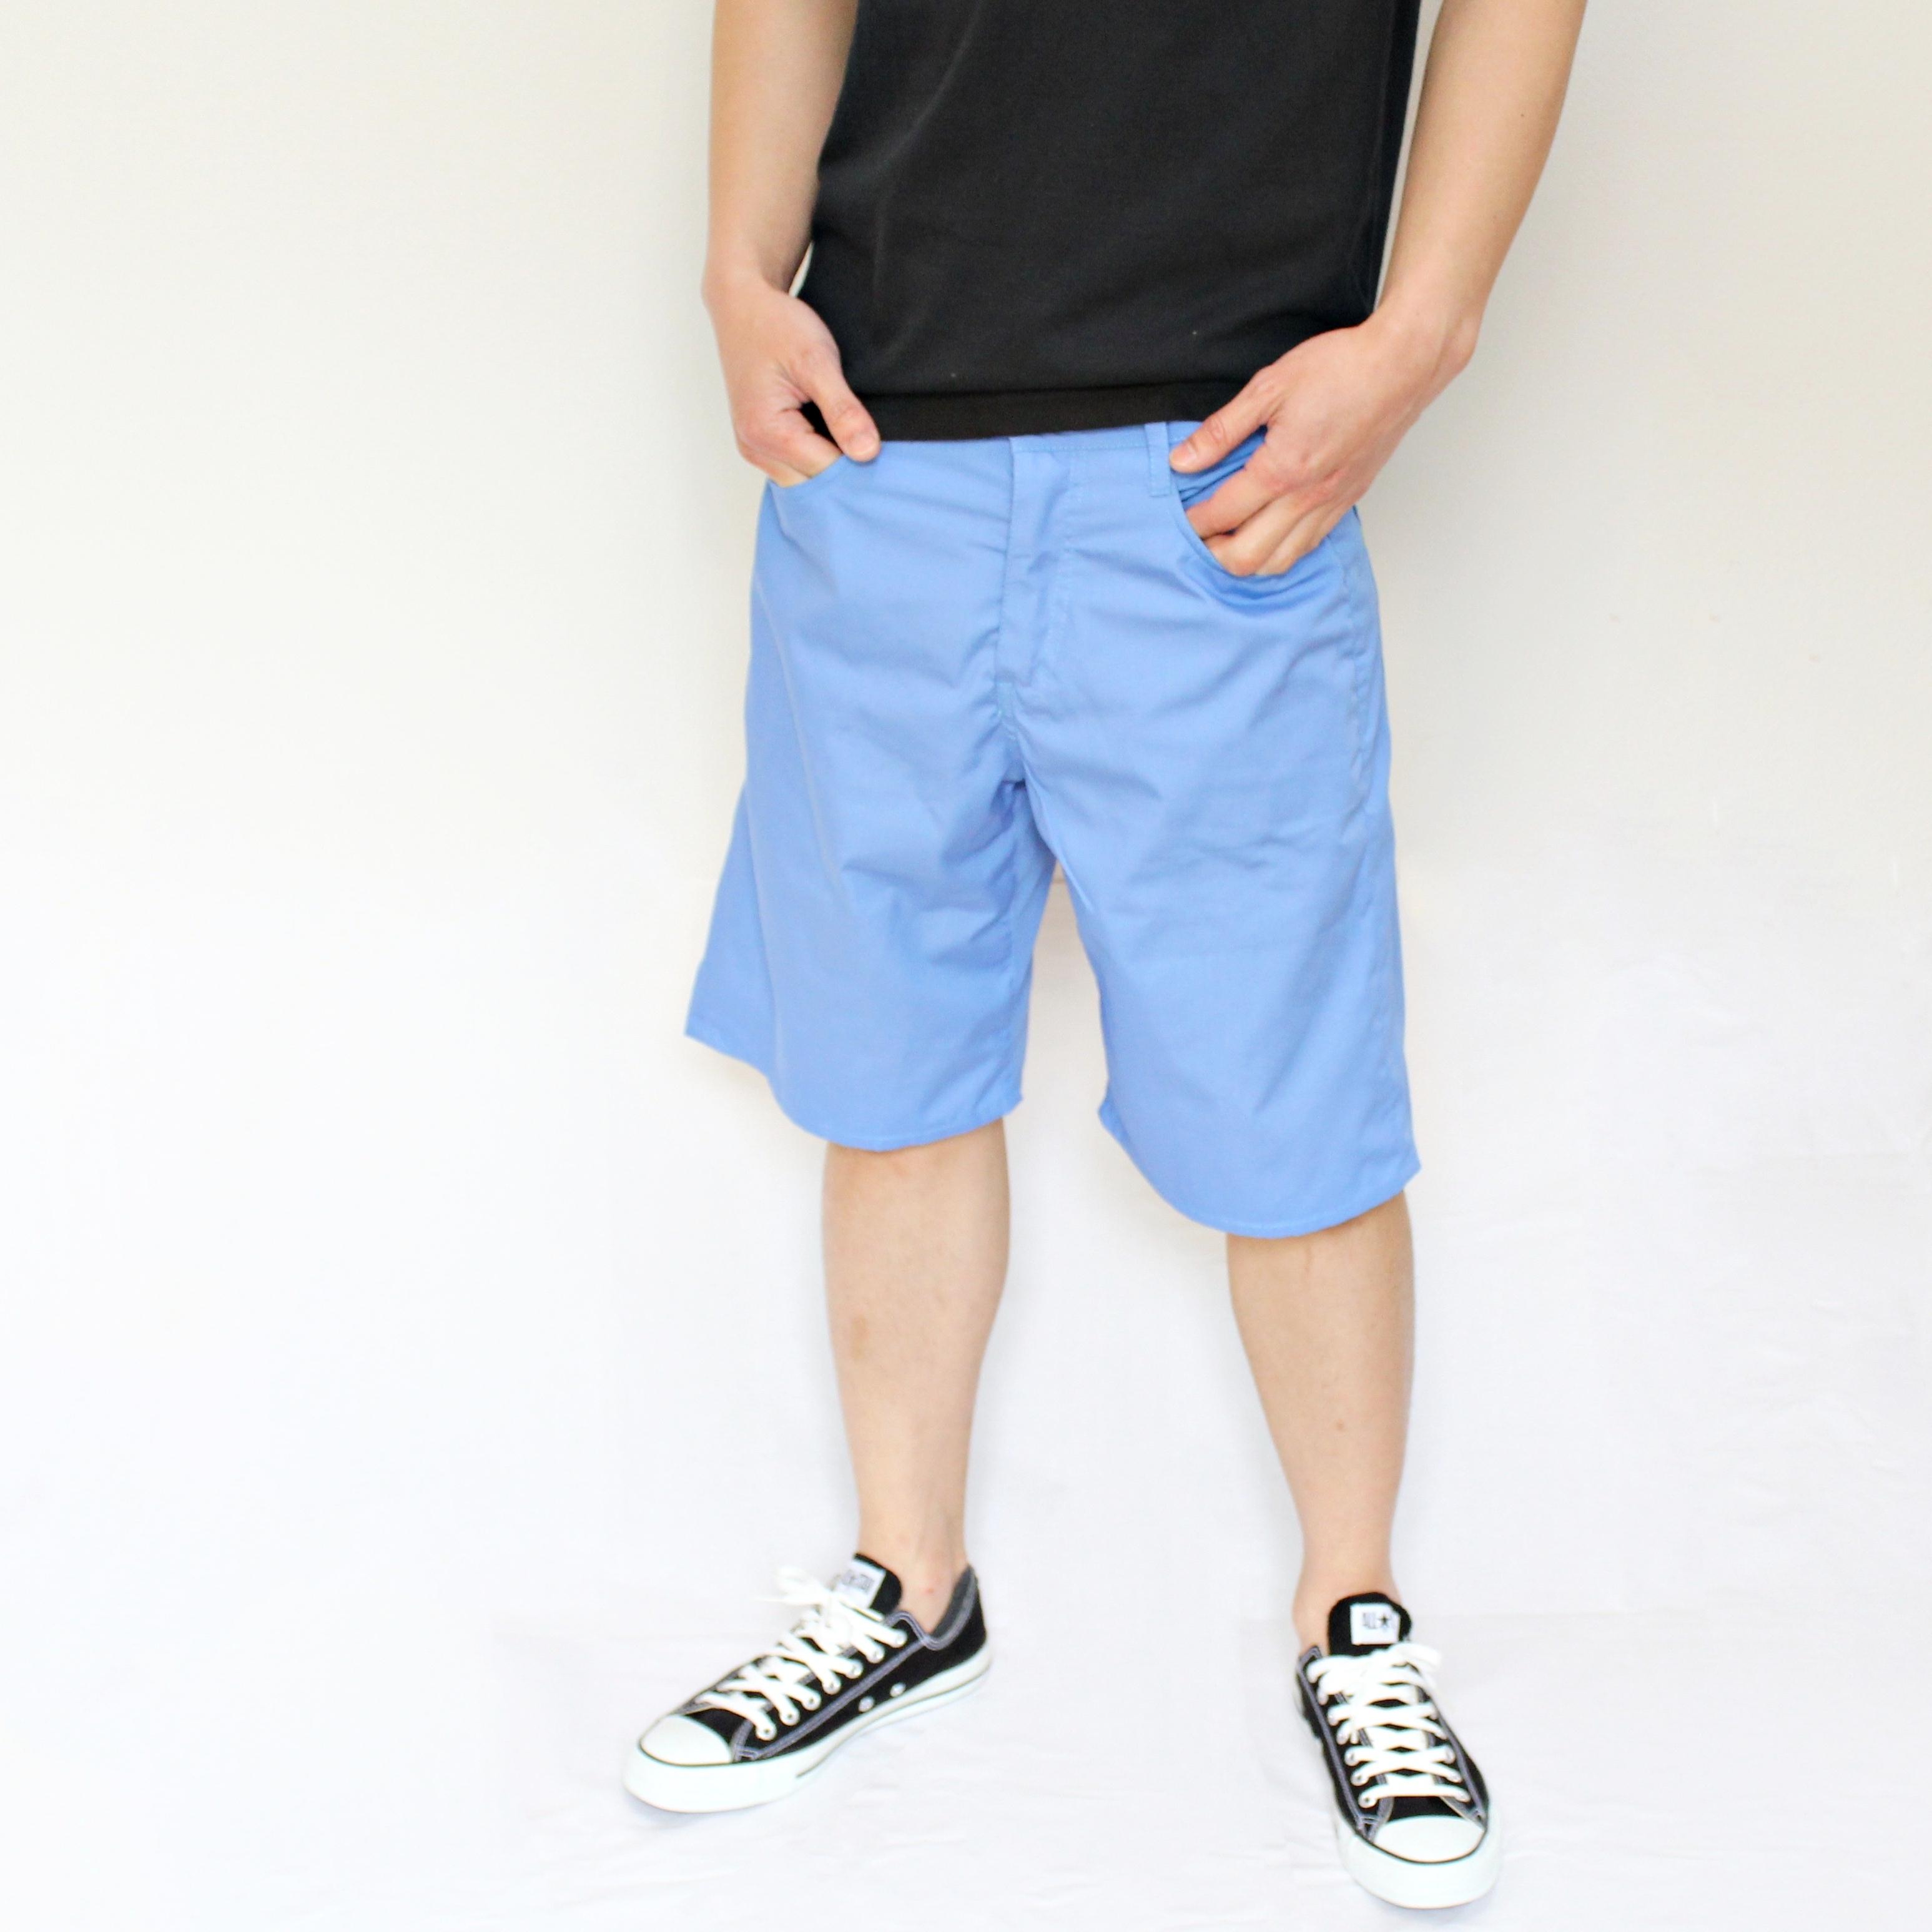 iggy shorts LIGHT BLUE - 画像2